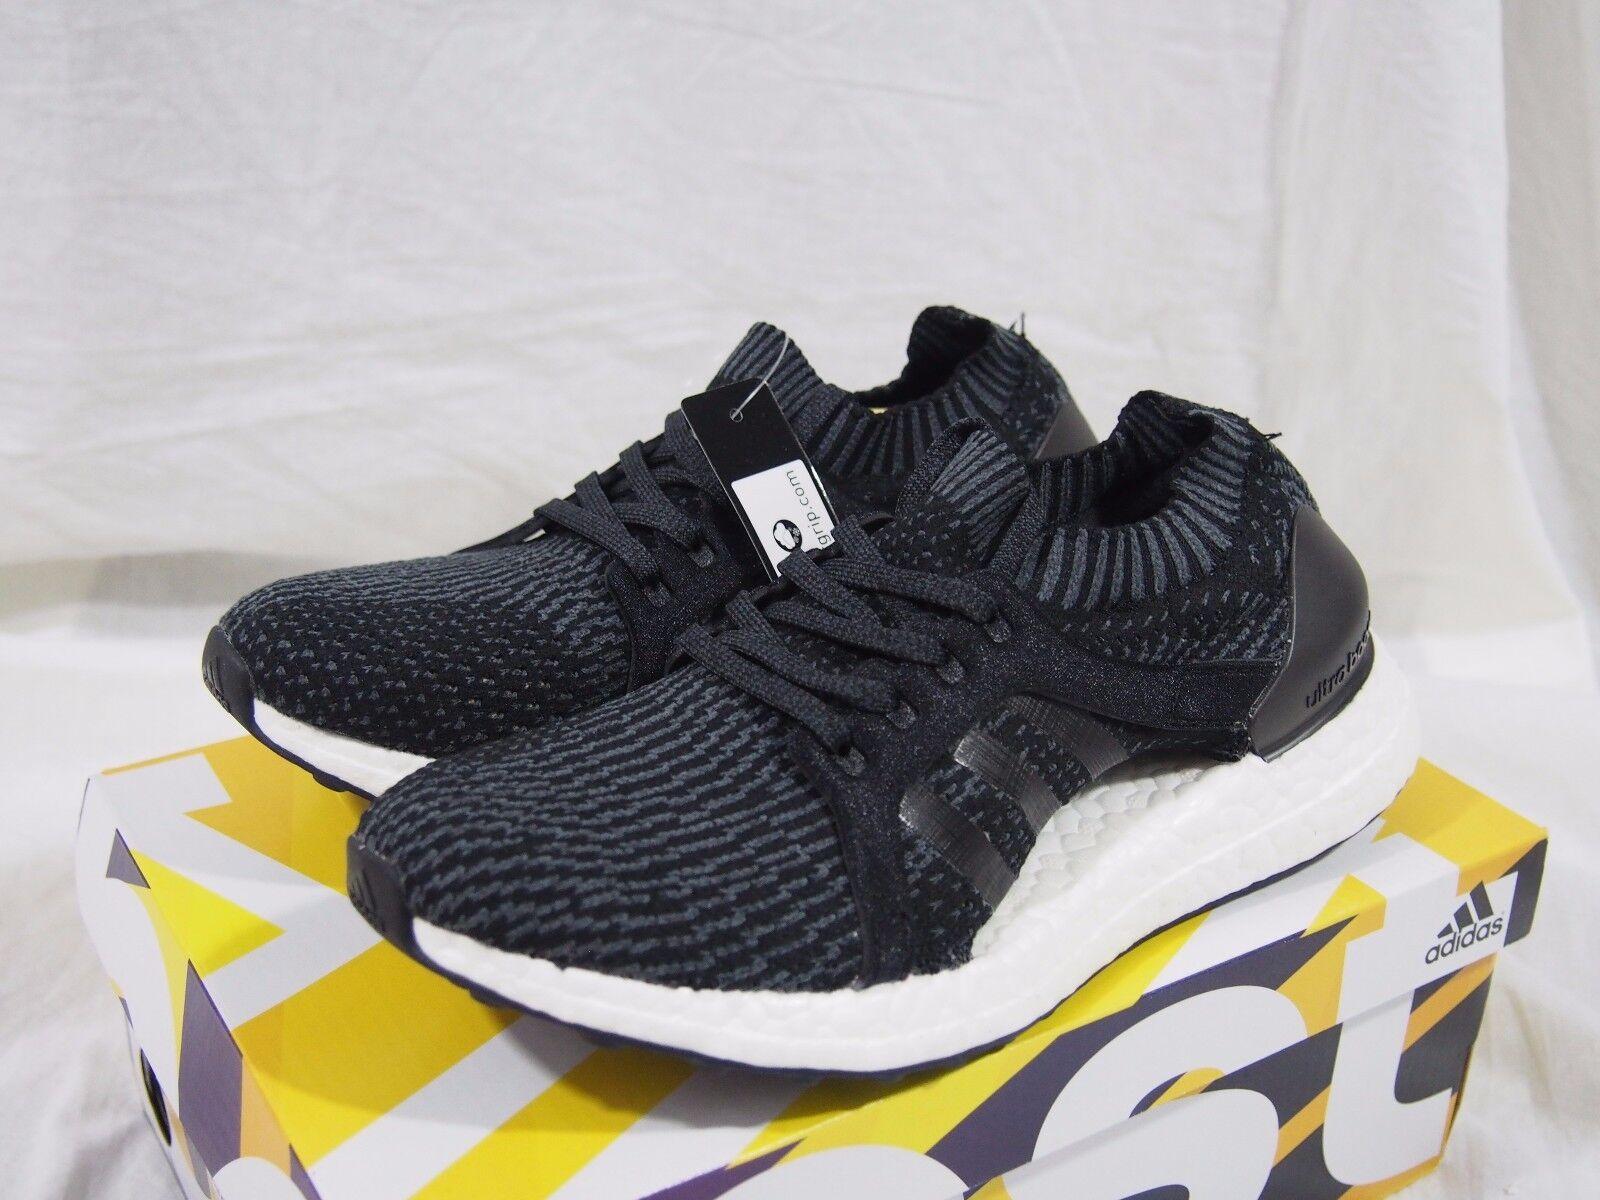 half off 2eca7 32c73 Adidas UltraBoost X Women's size 5.5 Core Black BB1696